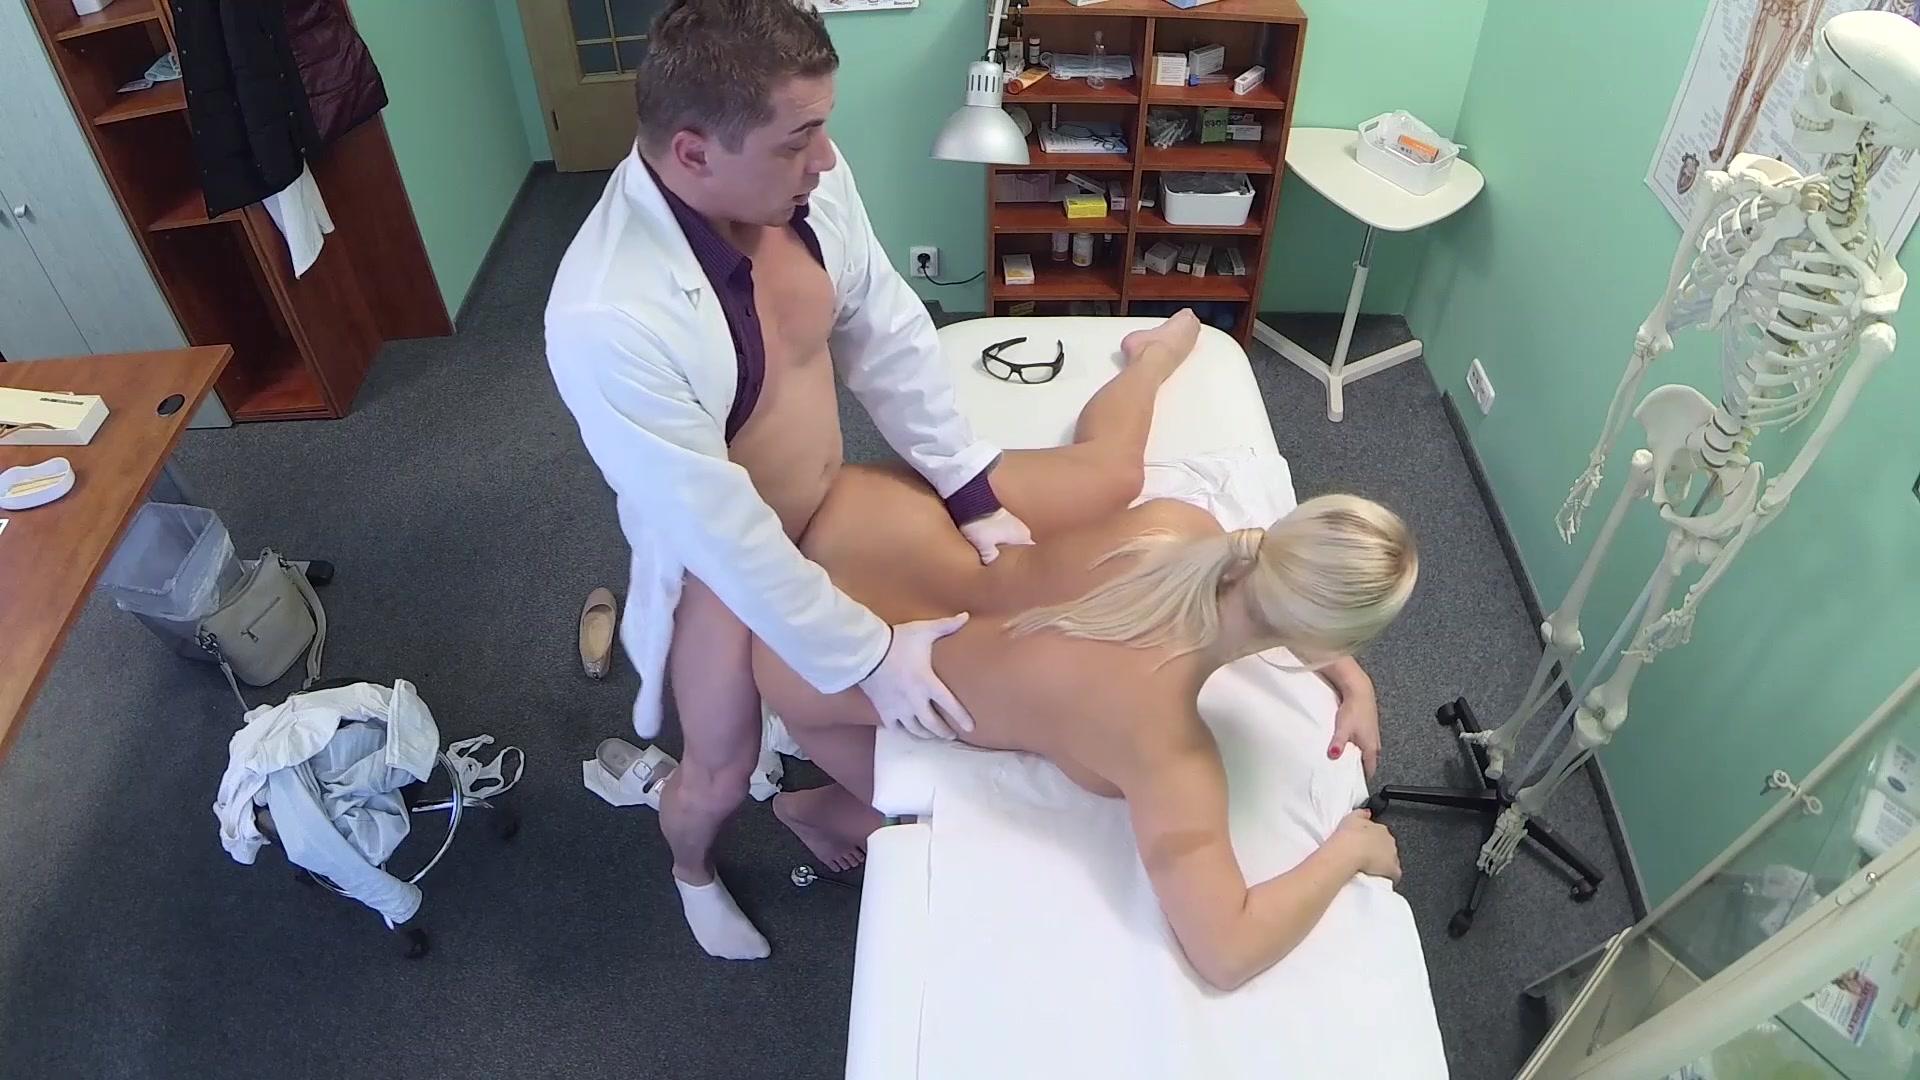 массаж корей скрытыйй камера секс